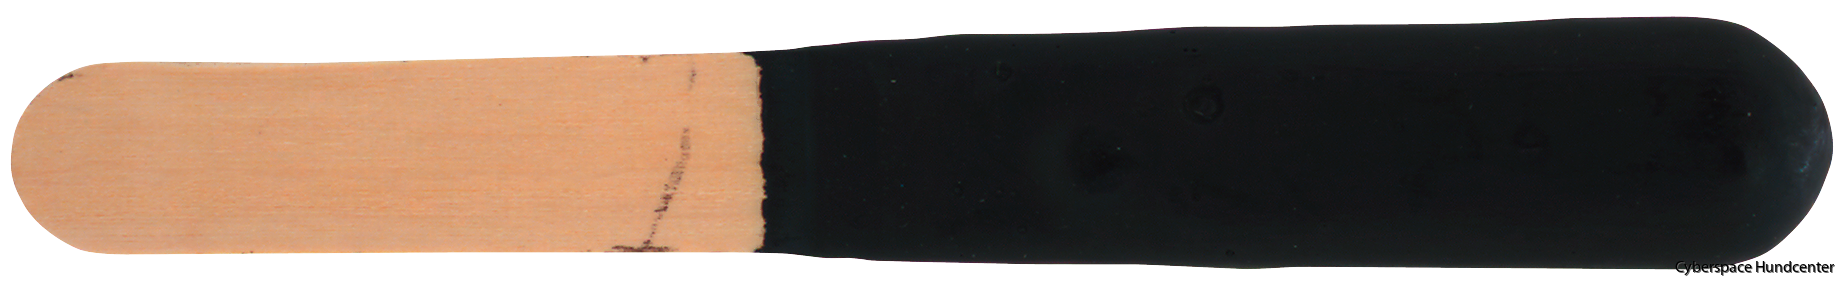 021-Black-ChrisStix_FullRes